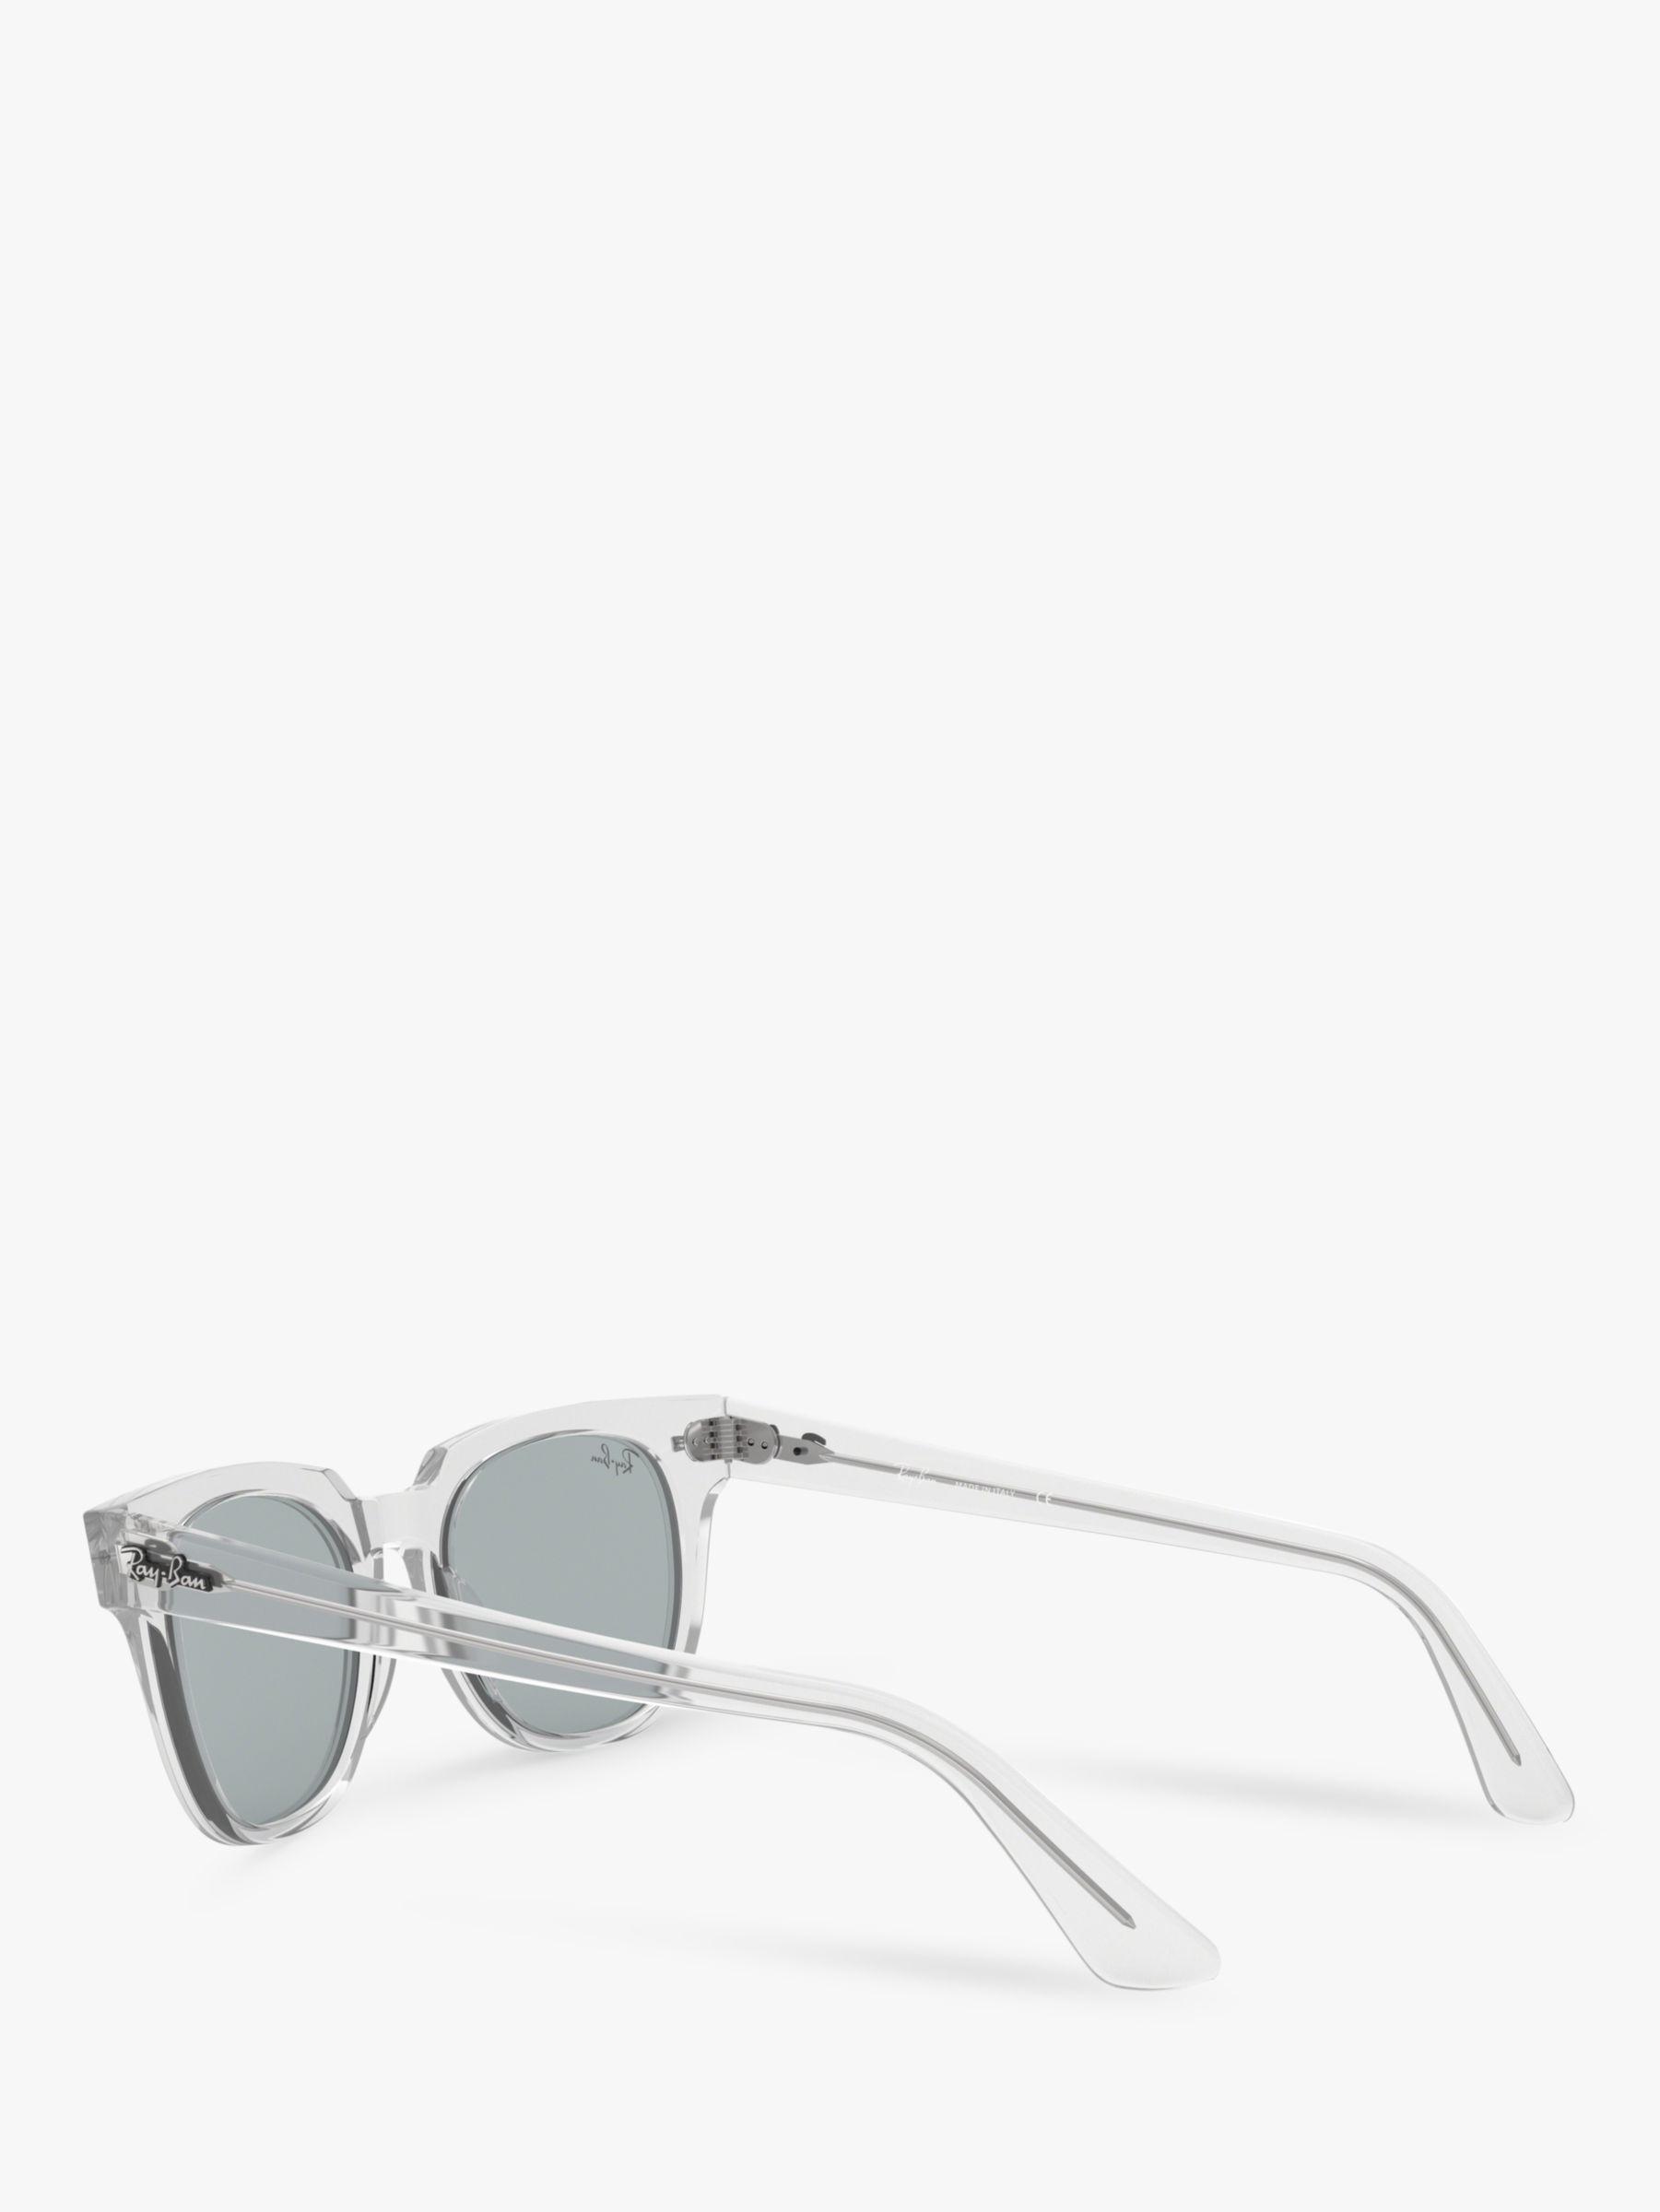 ray ban rb2168 unisex square sunglasses at john lewis partners Discount Ray Bans buyray ban rb2168 unisex square sunglasses clear blue online at johnlewis